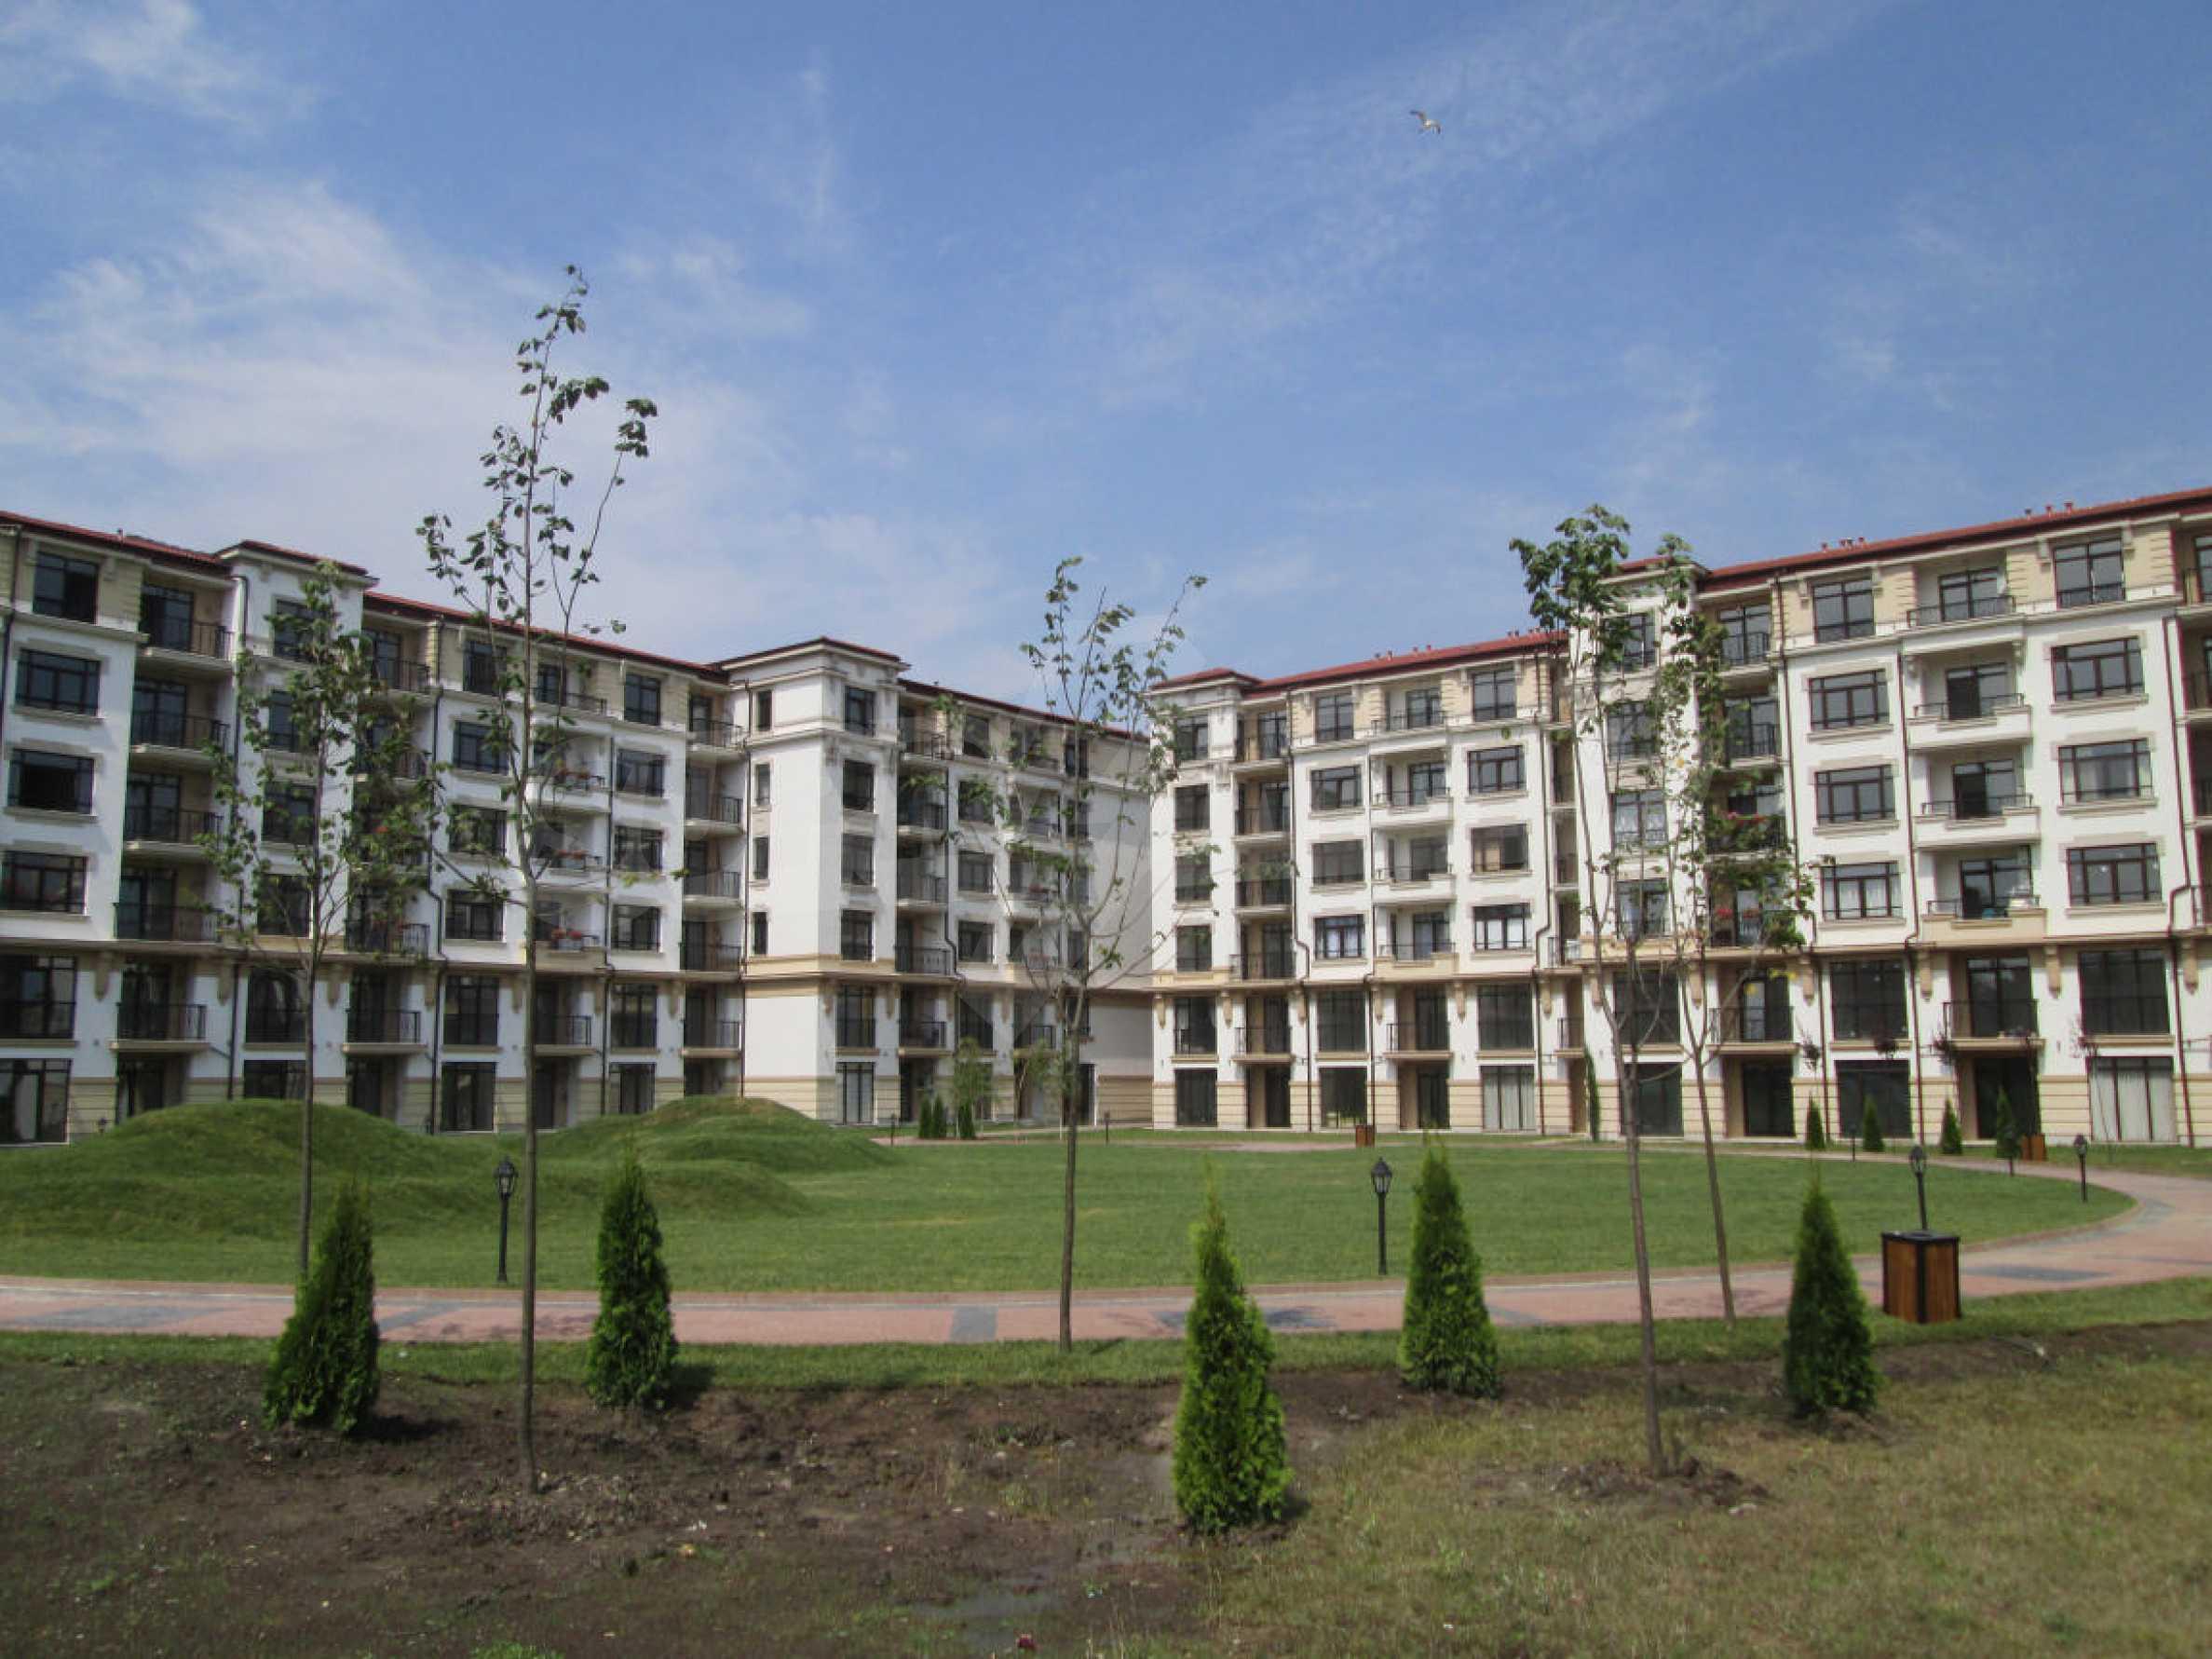 Aivazovsky Park 37